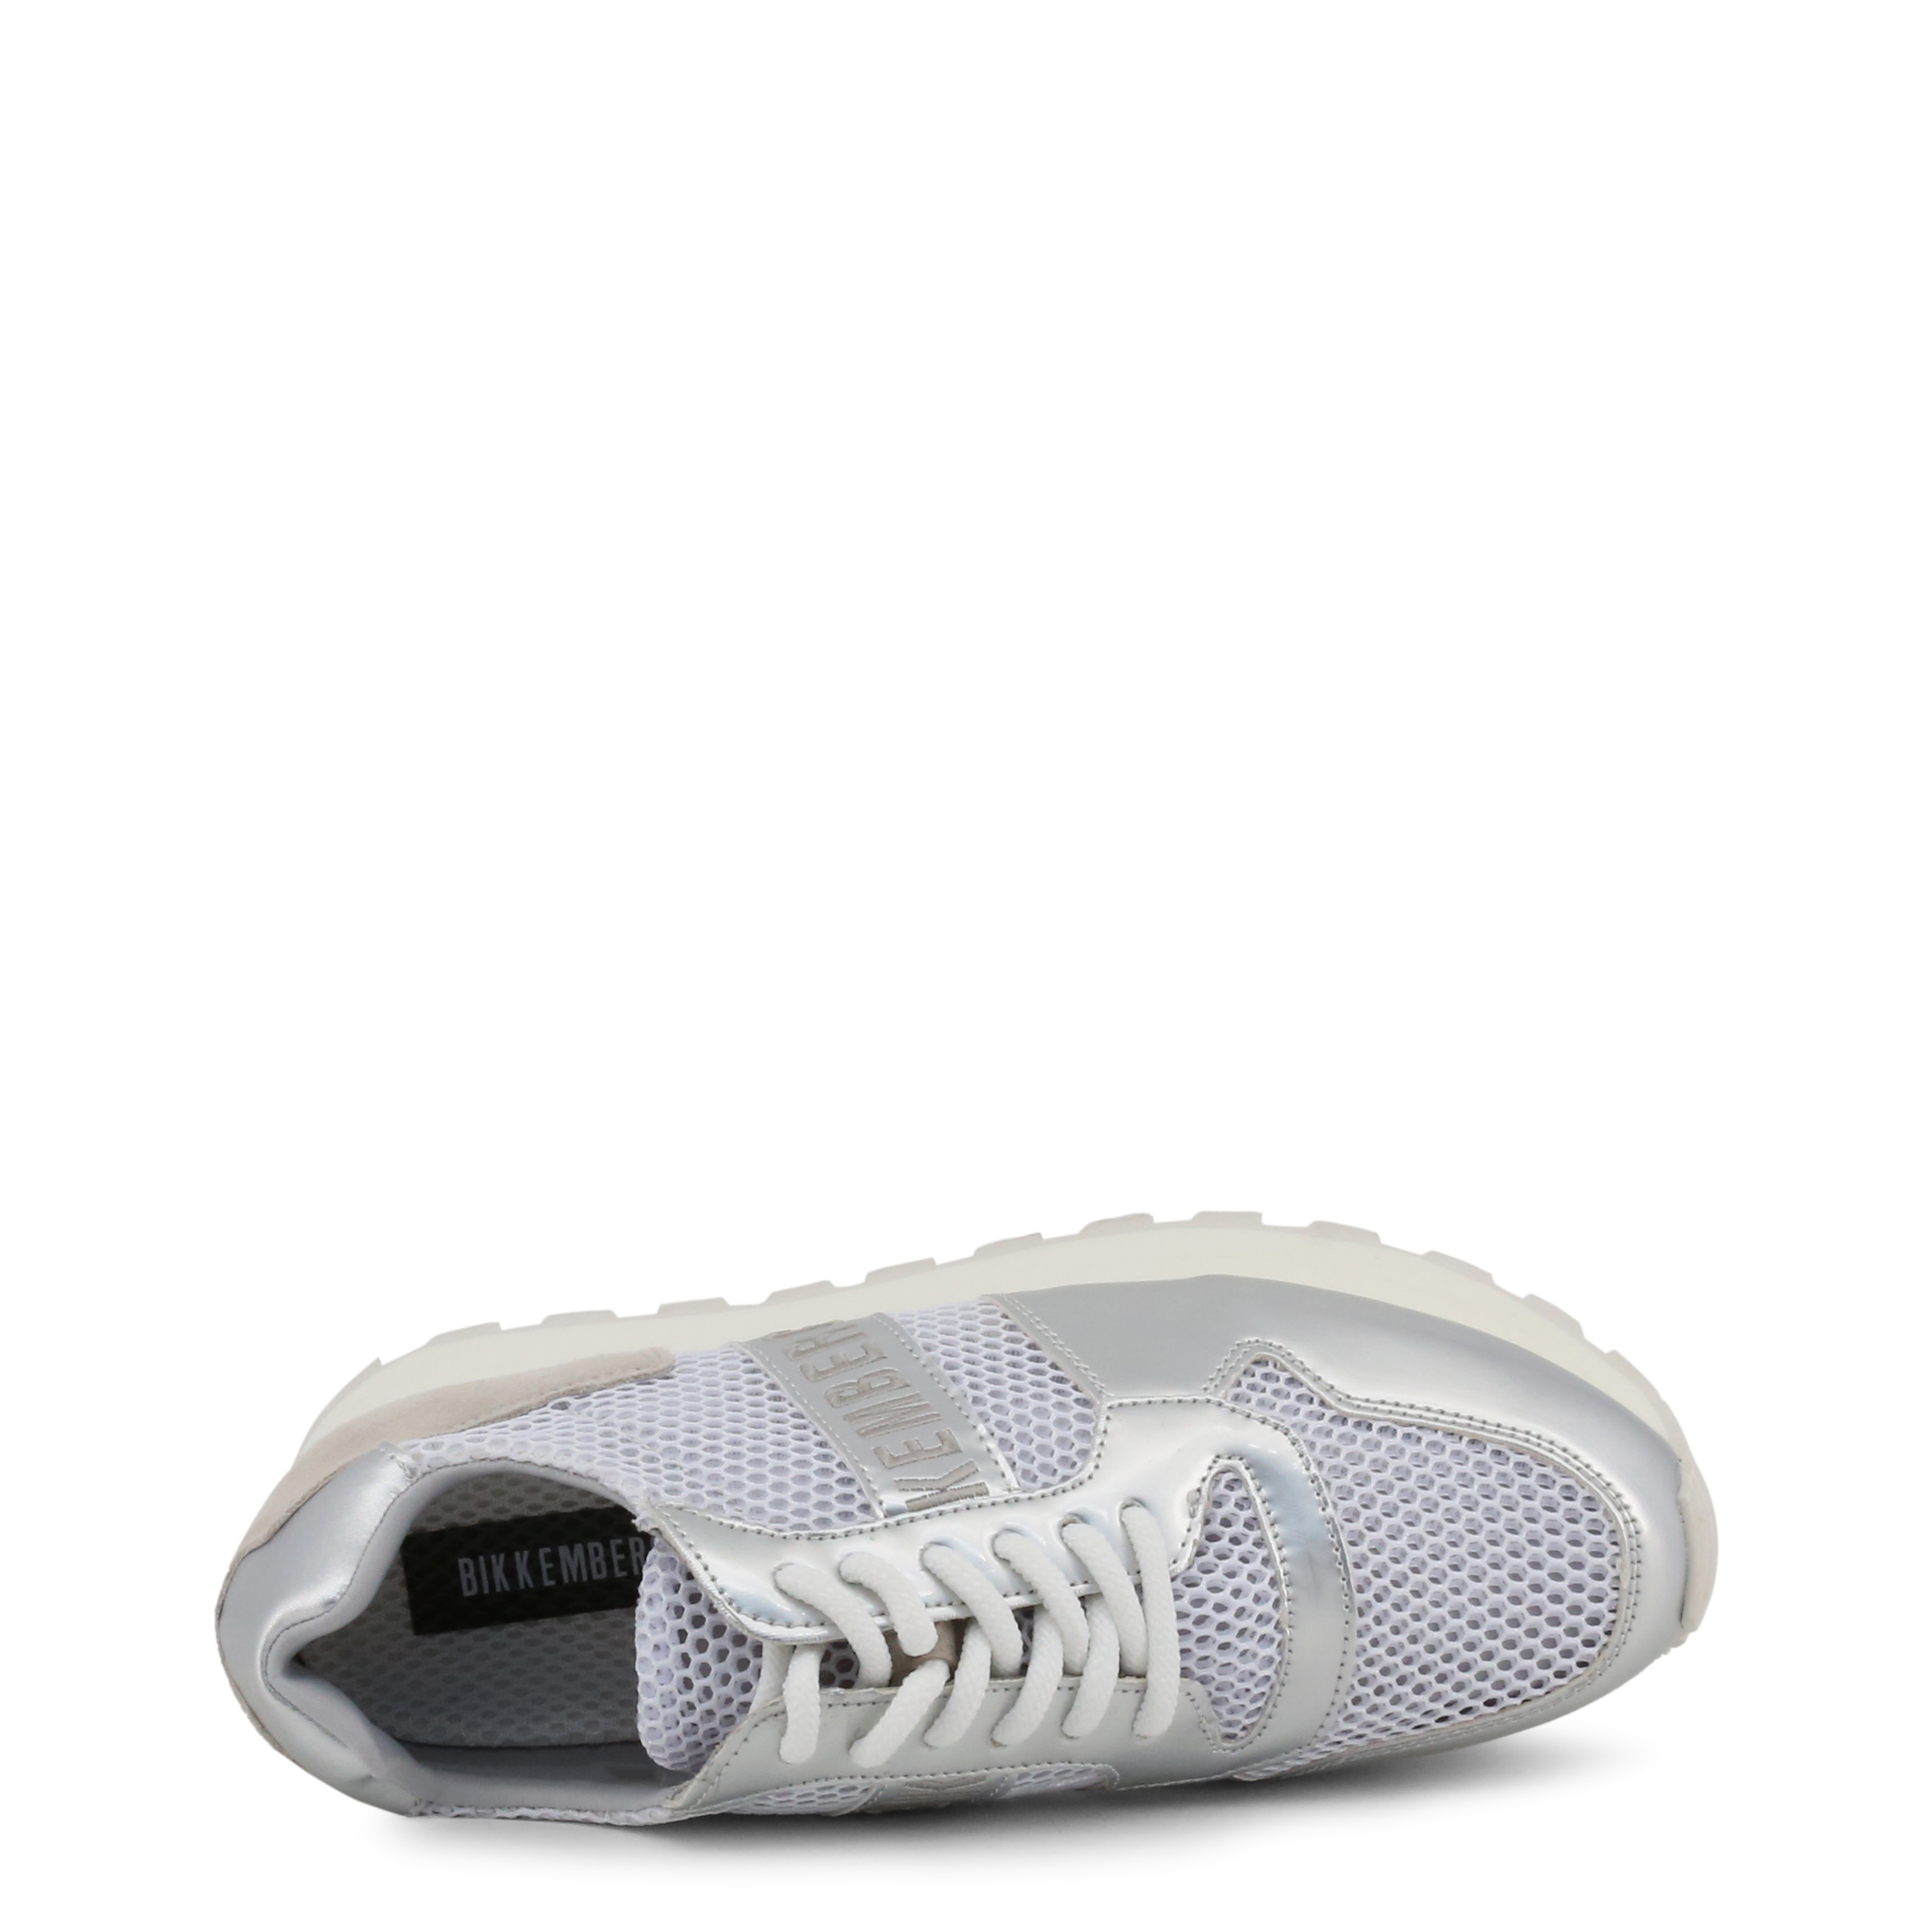 Sneakers Bikkembergs FEND-ER_2087-MESH Donna Bianco 98833